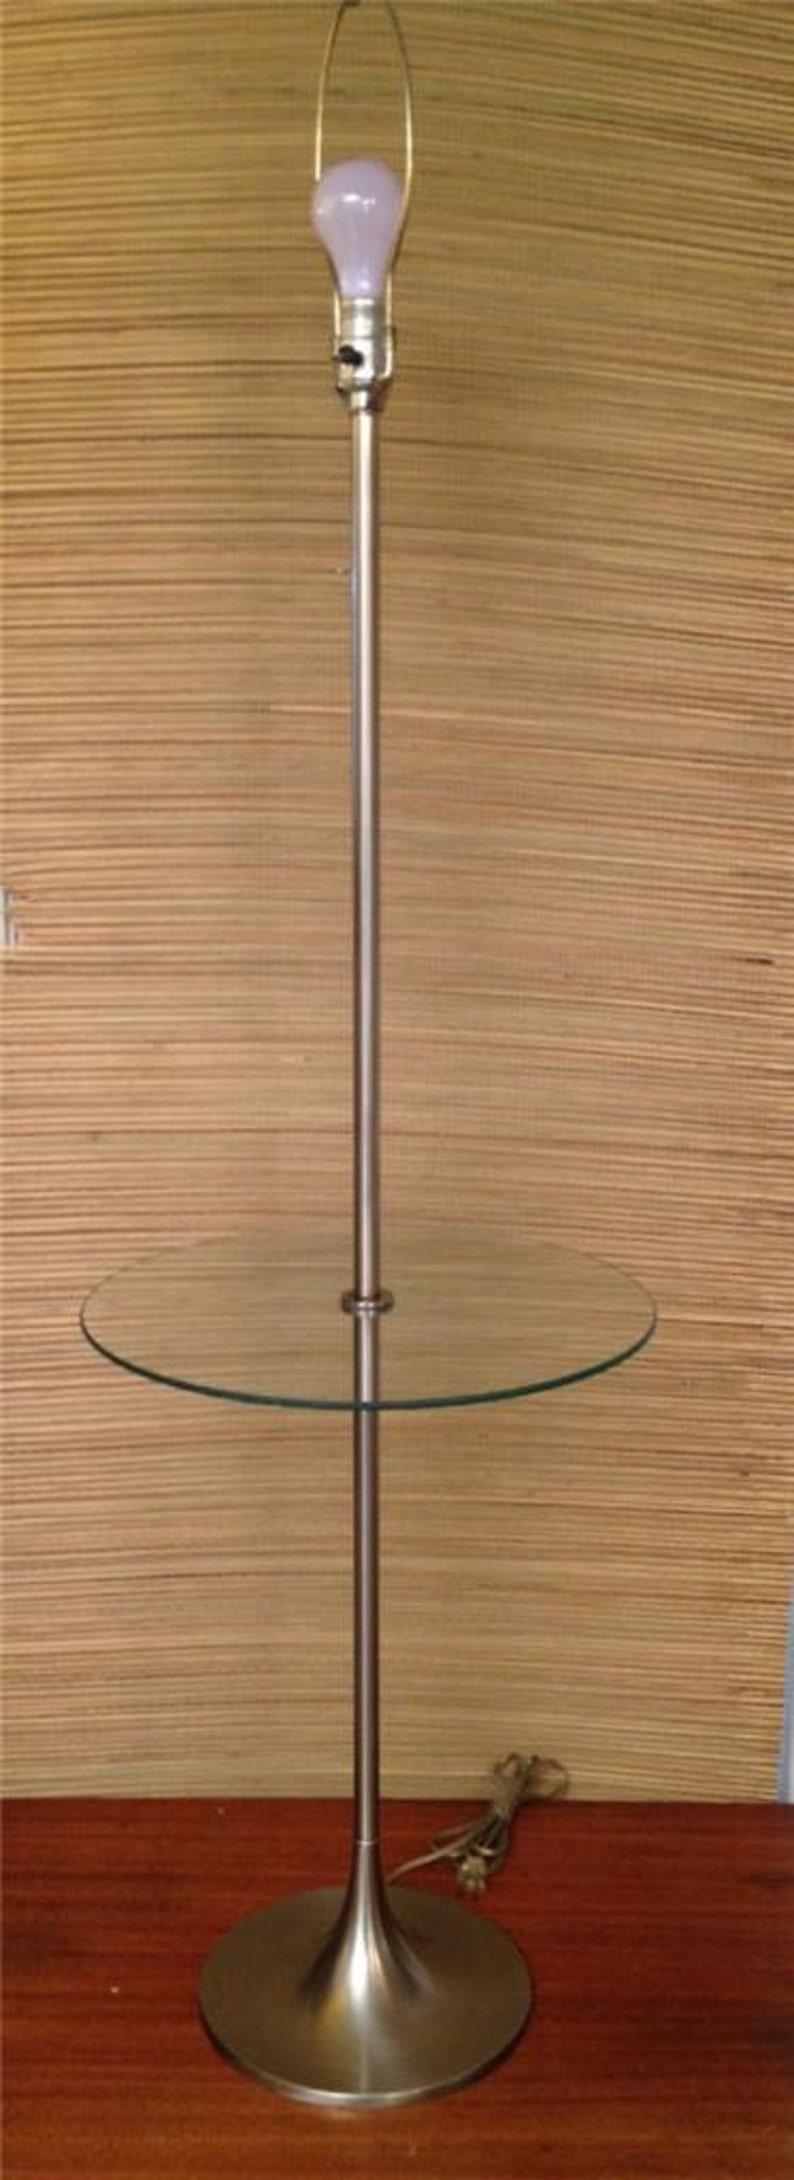 Vintage Laurel Floor Lamp TABLE Nickel Tulip Base Mid-Century Modern 1960/'s Saarinen Eames Era